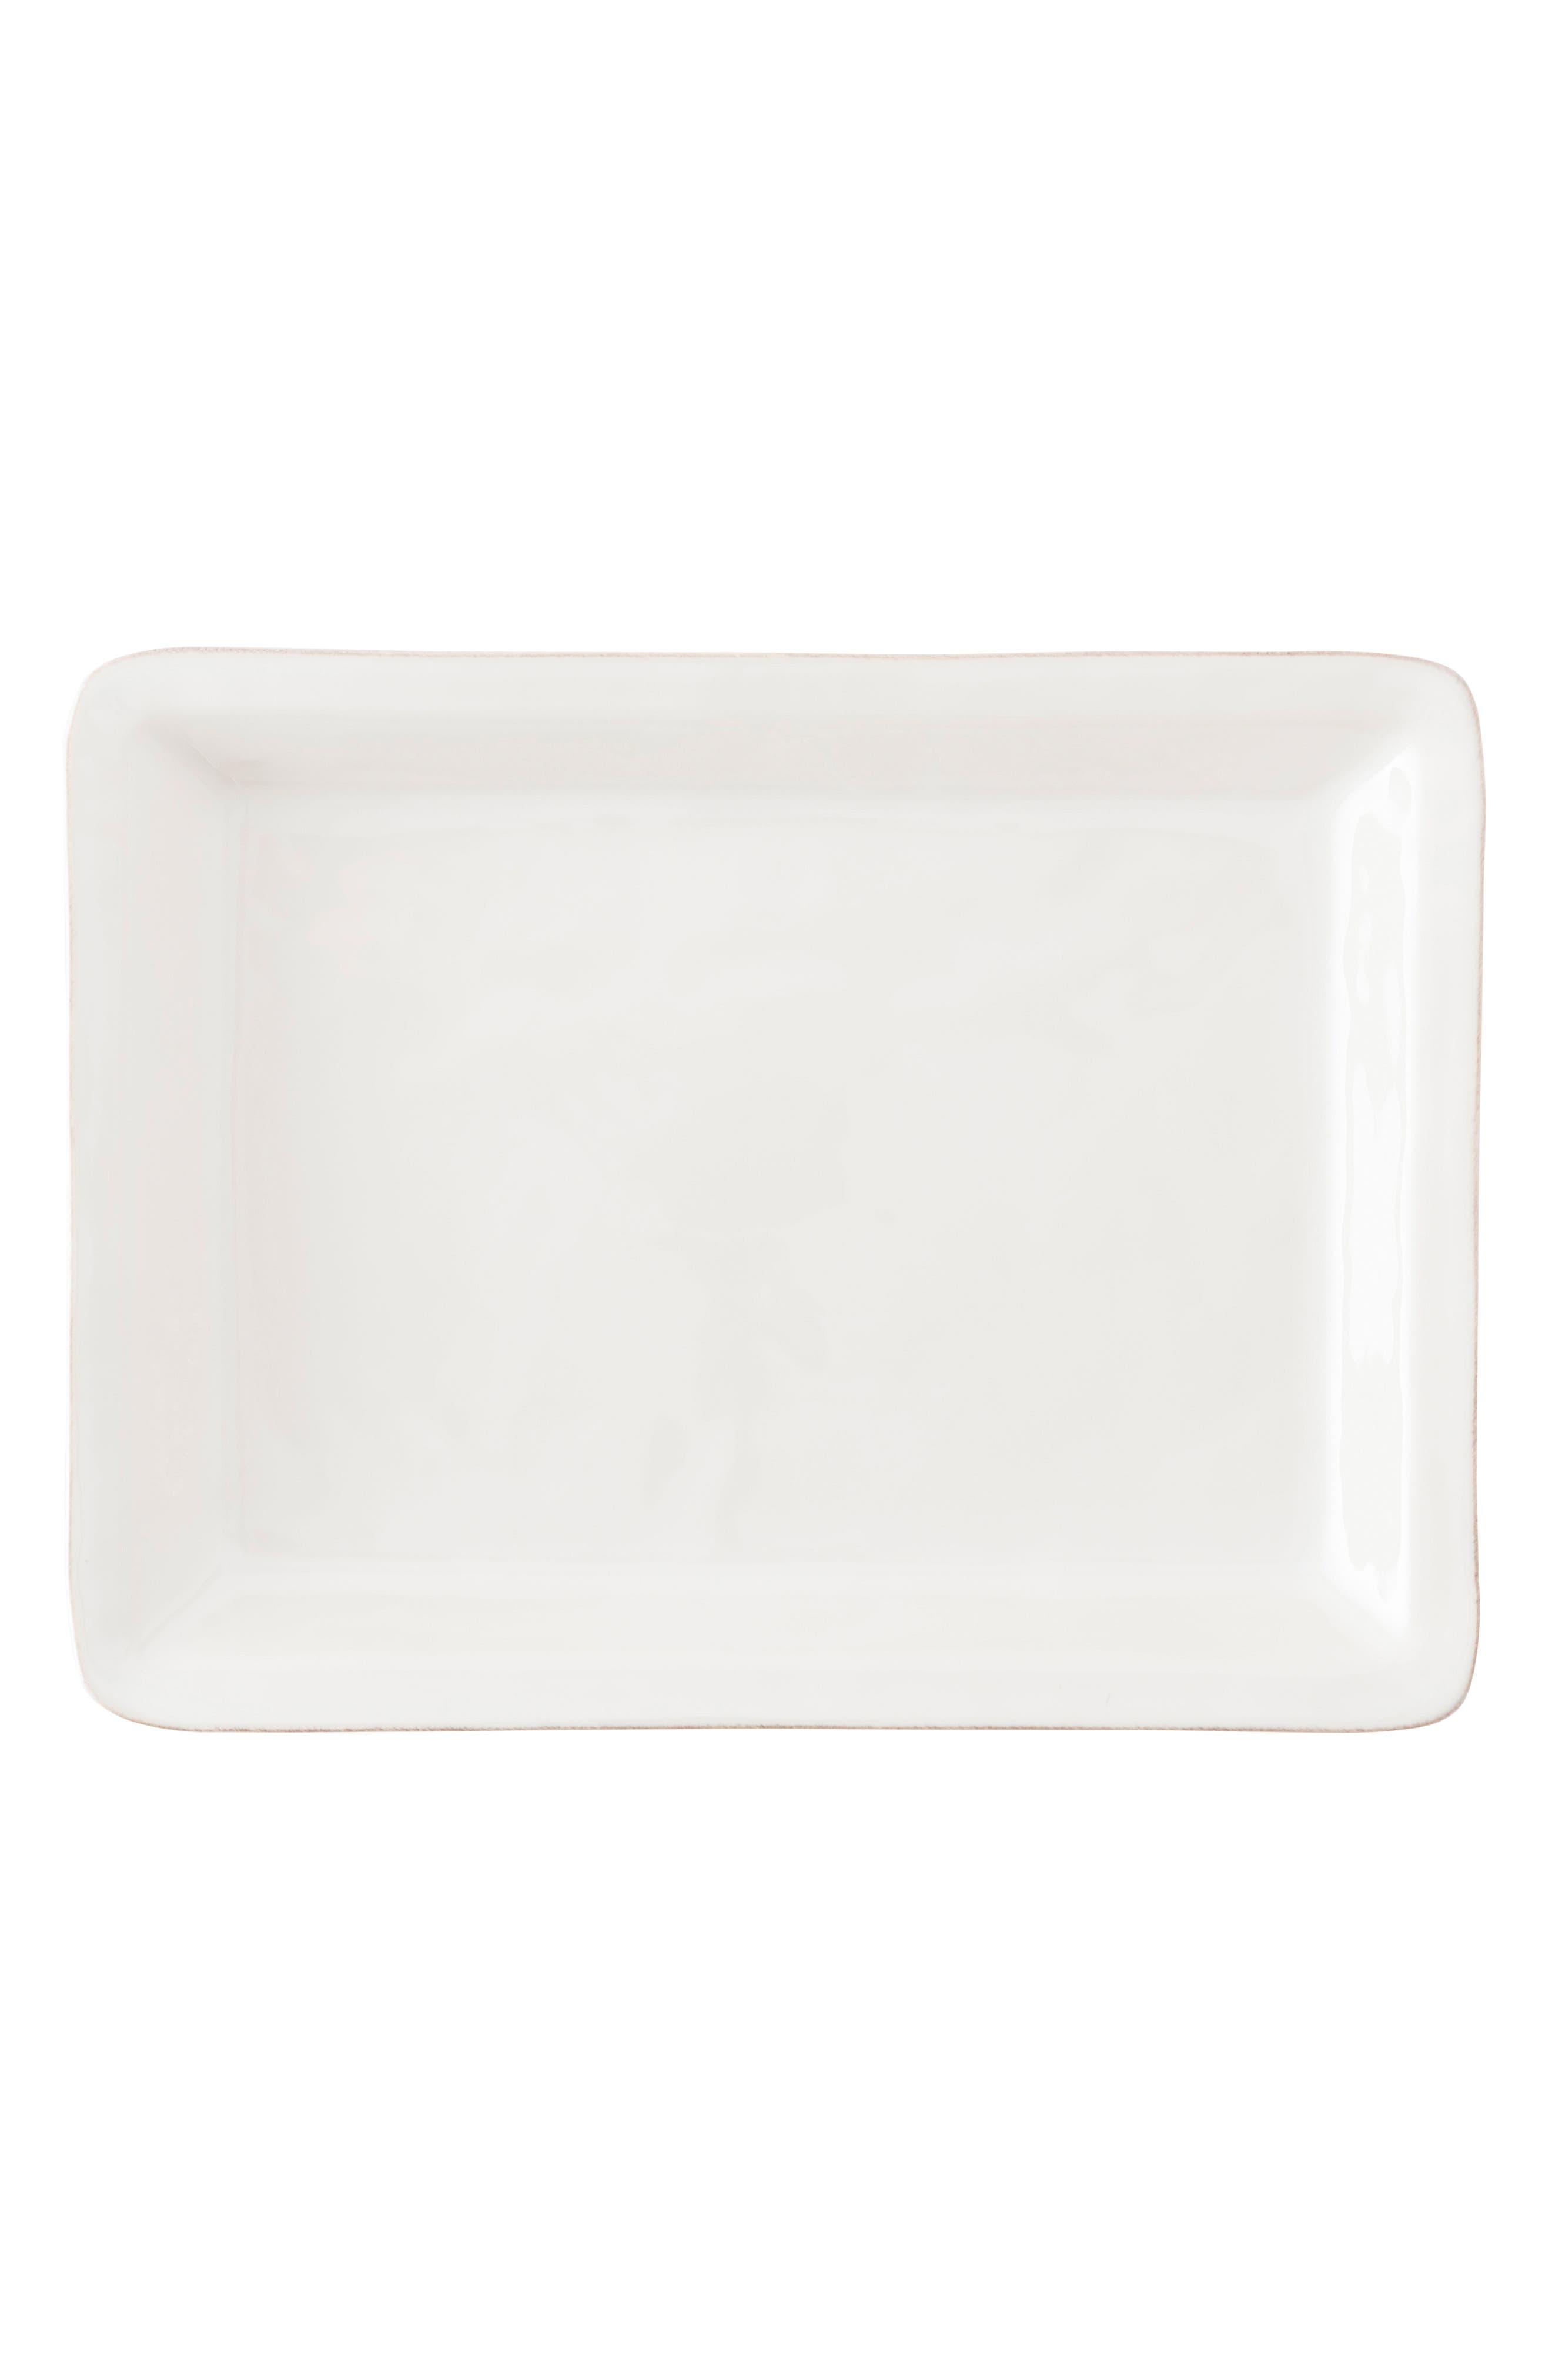 Puro Large Ceramic Serving Tray,                         Main,                         color, WHITEWASH